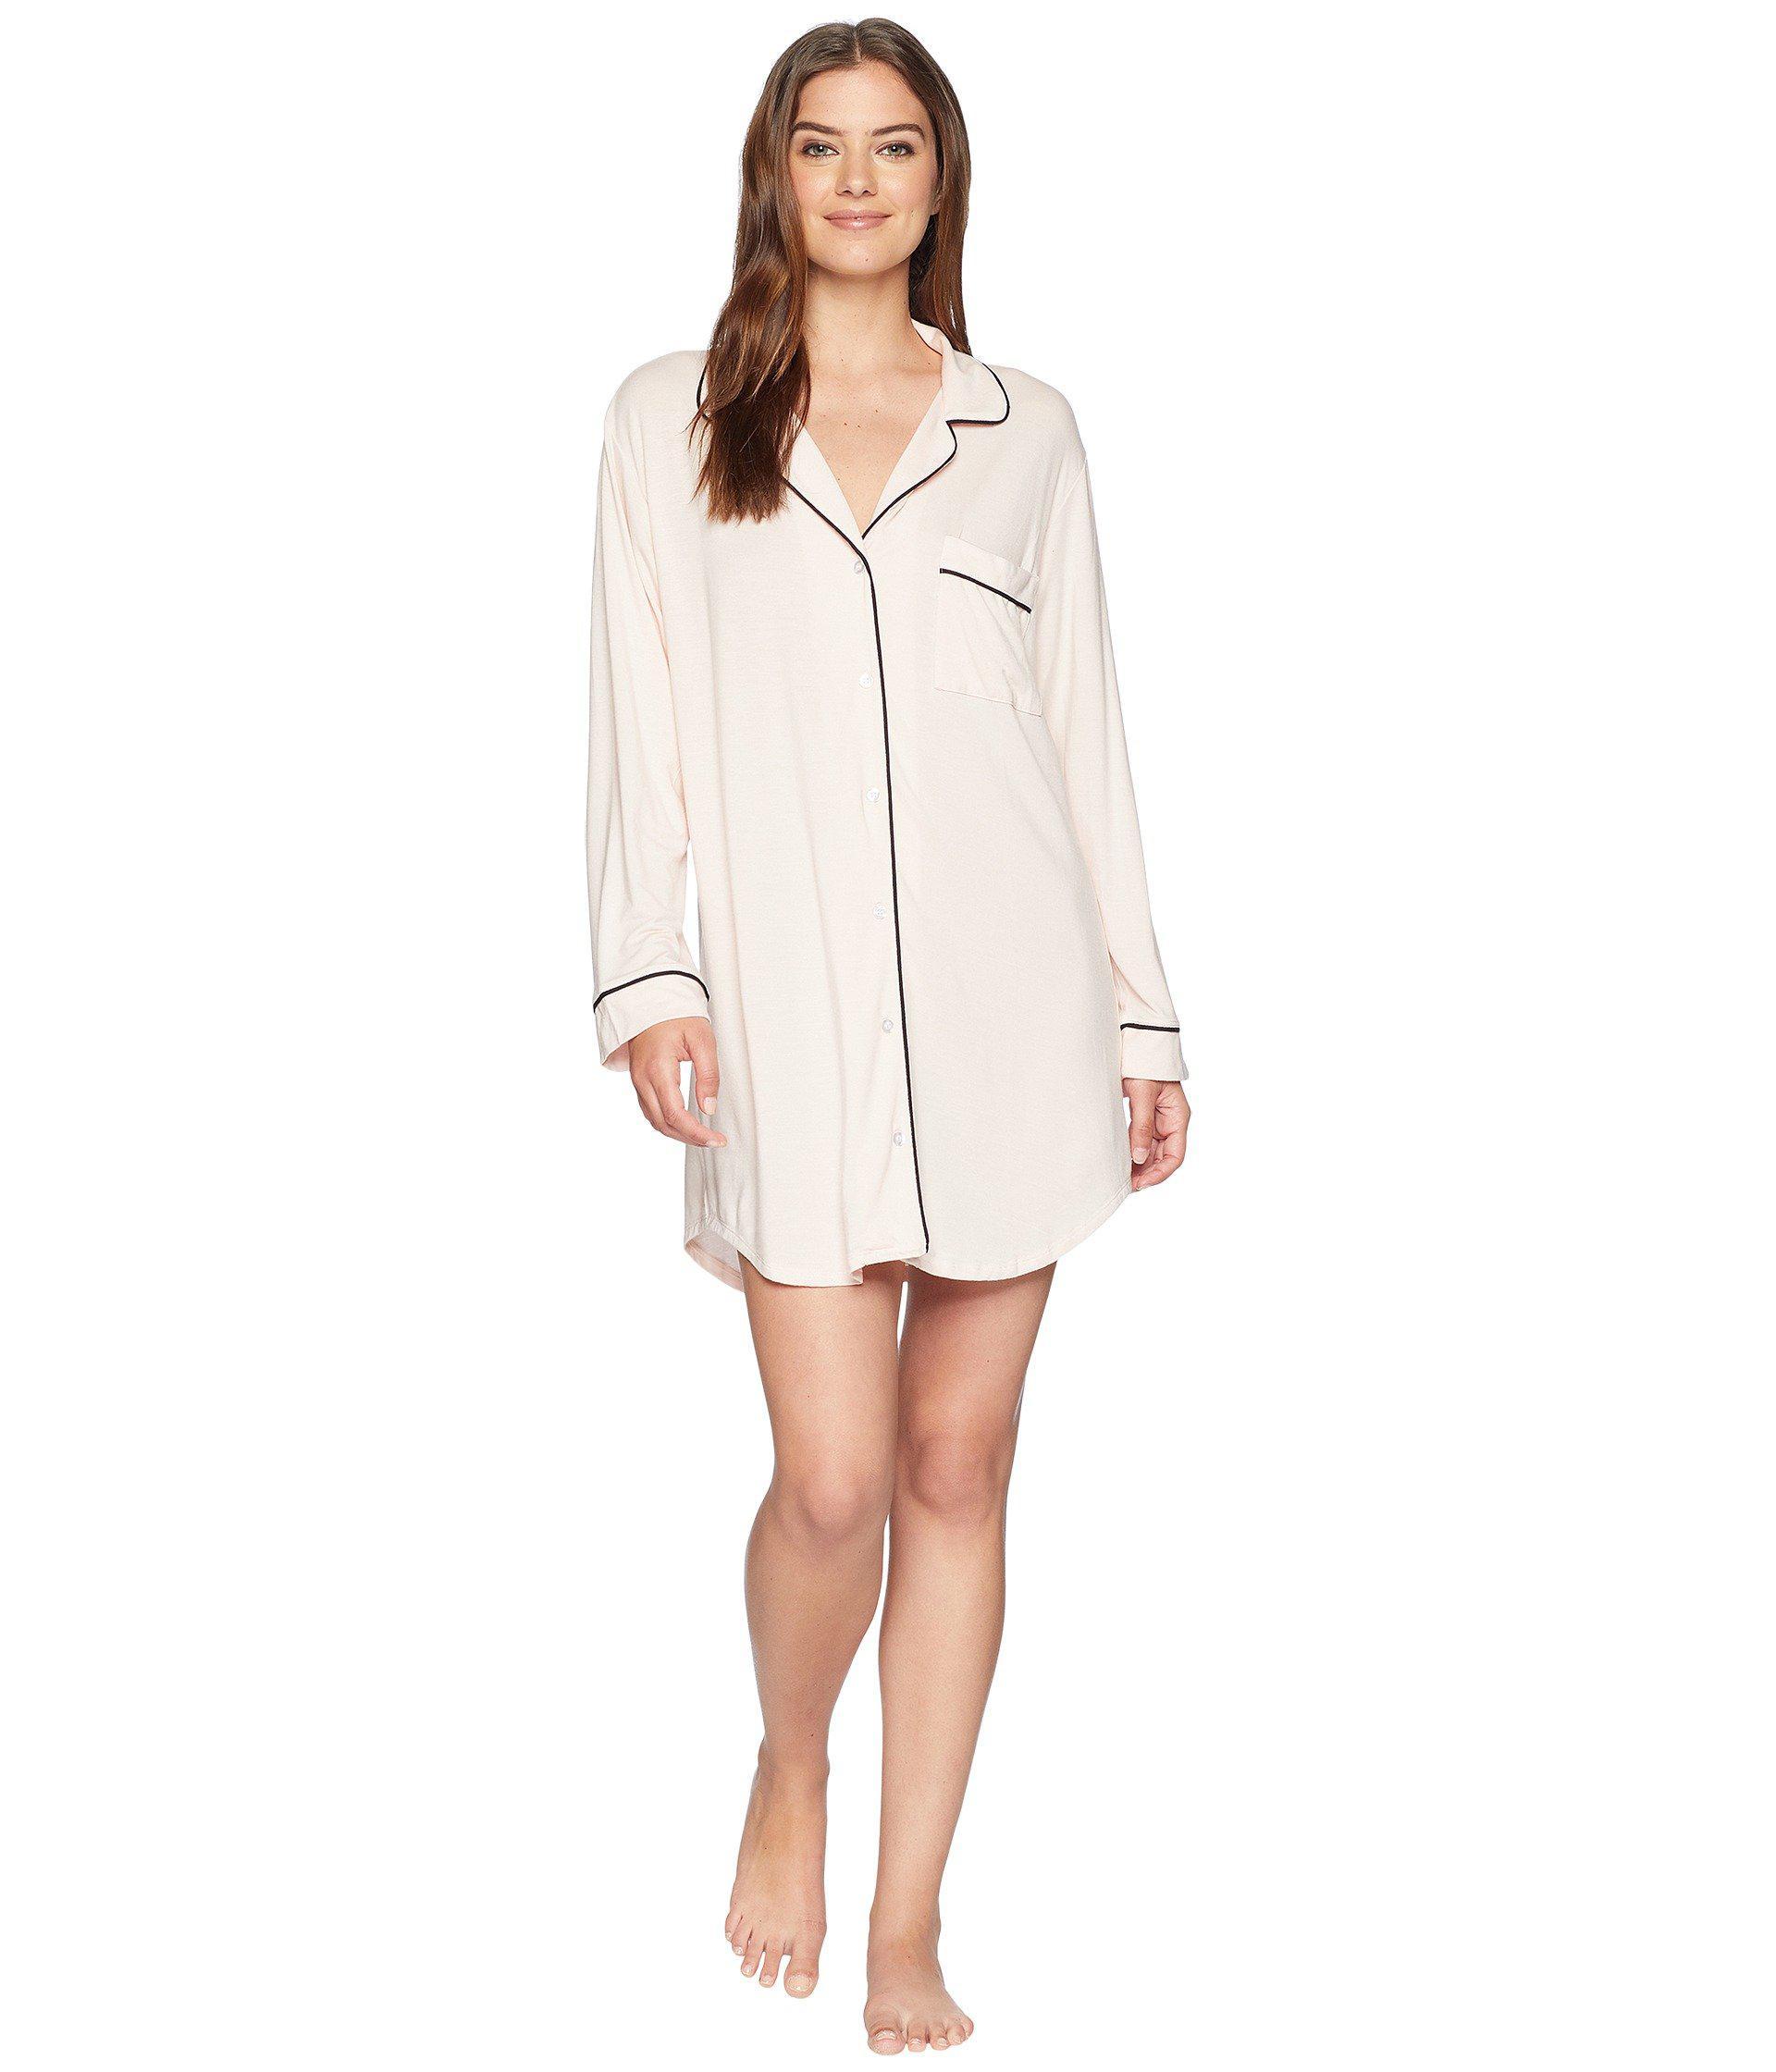 eb349b9f5 Lyst - Eberjey Gisele Nightshirt (sorbet black) Women s Pajama in White